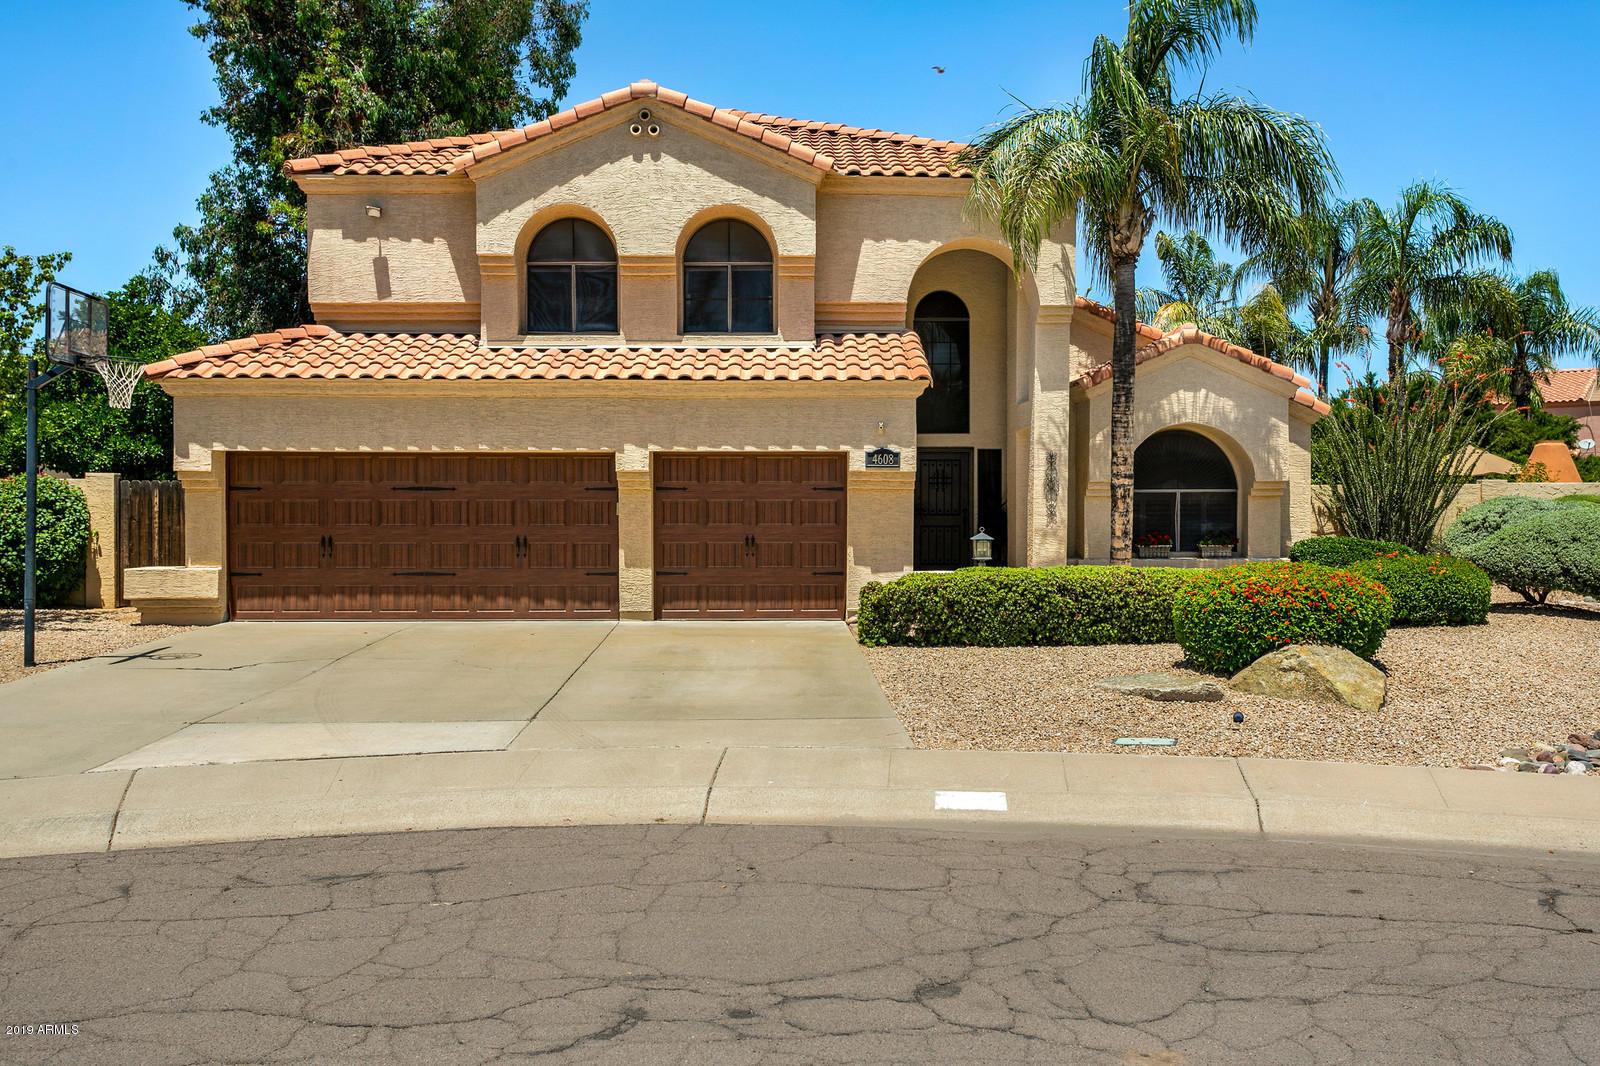 Photo of 4608 E MARCONI Avenue, Phoenix, AZ 85032